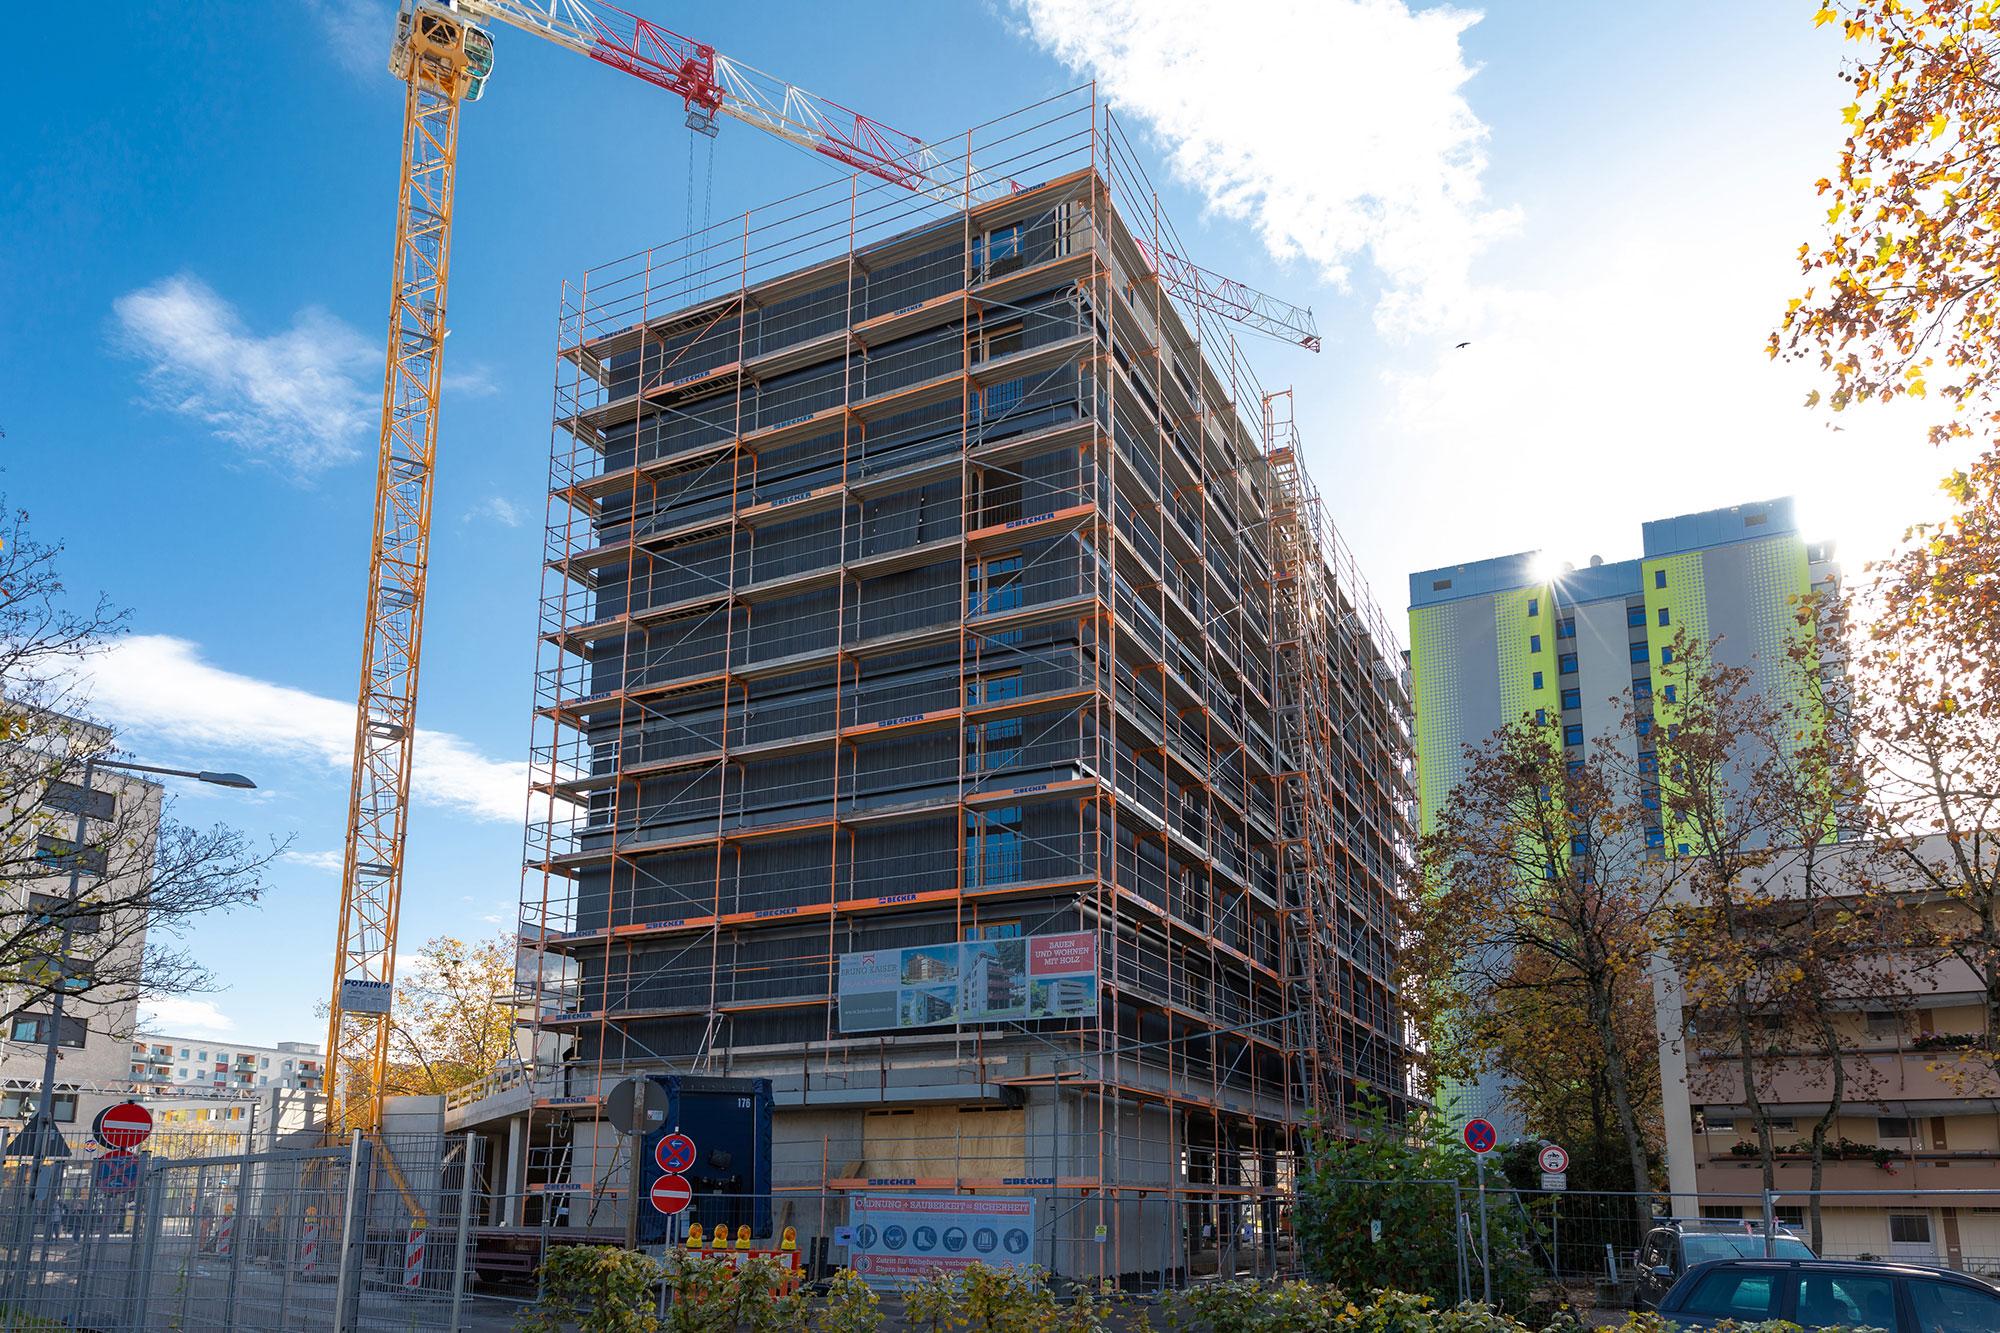 Buggi 52 Freiburg Baustellentag